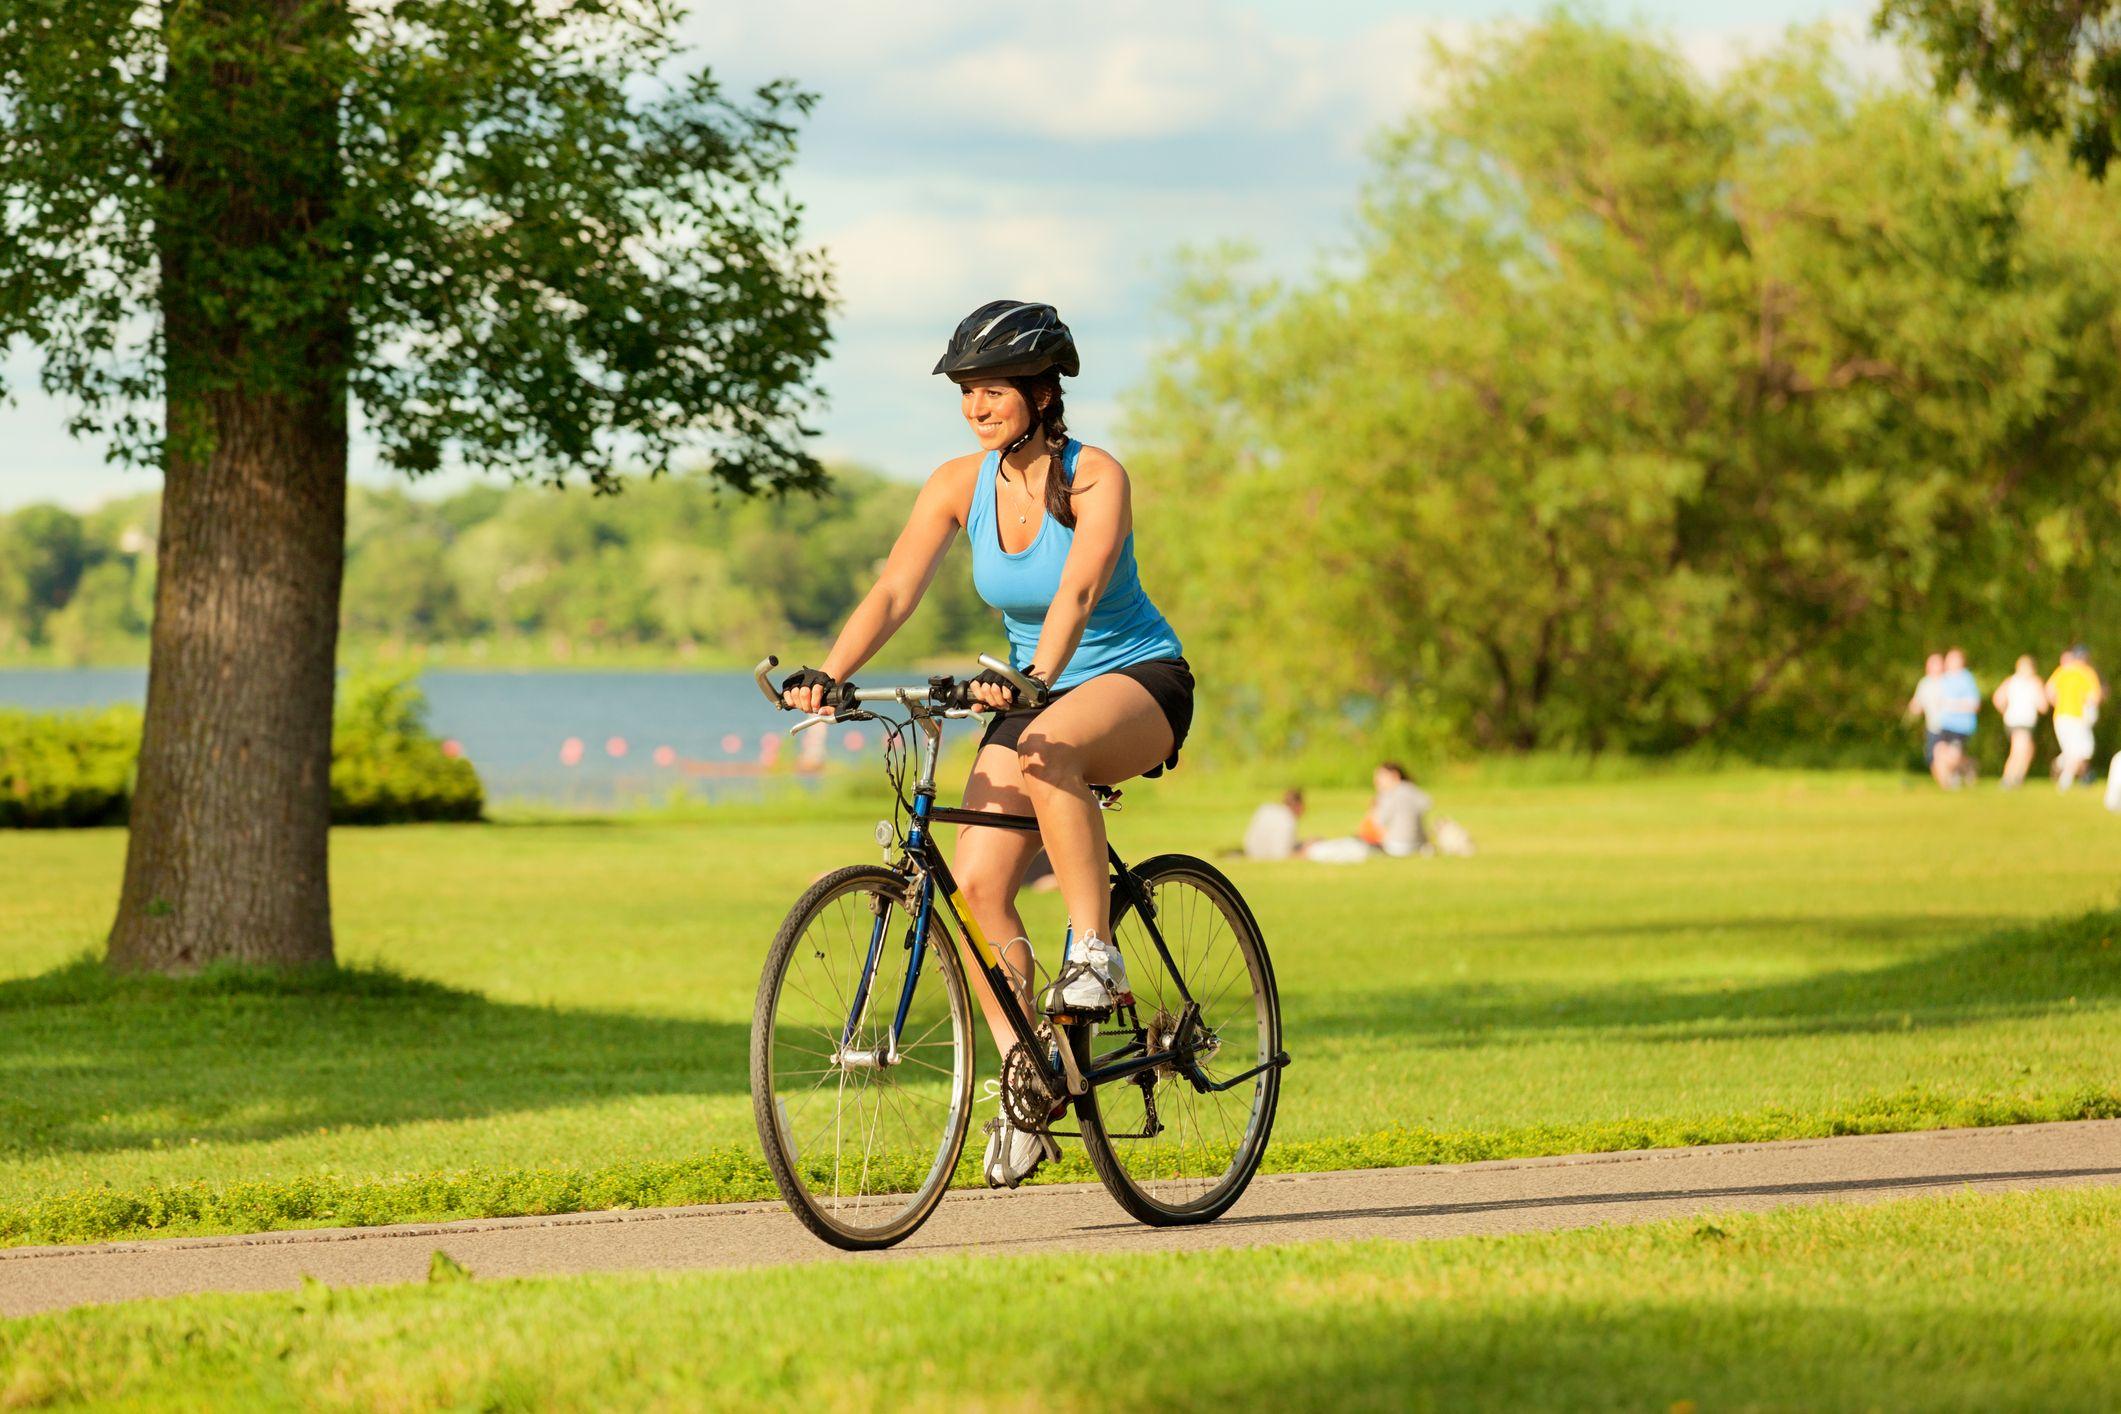 sport dimagrire ciclismo 1070709 origin